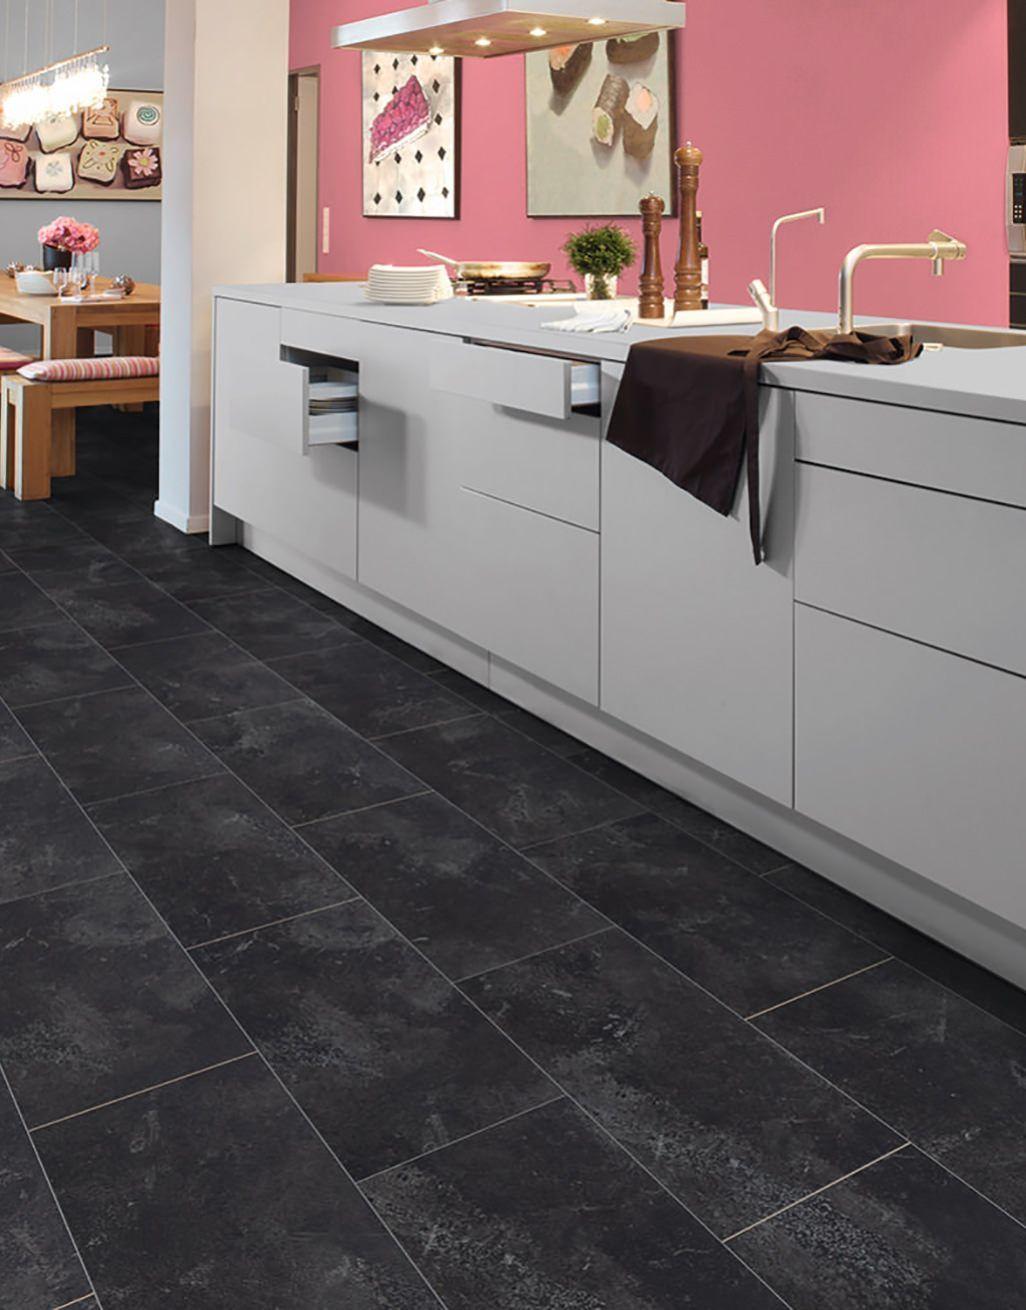 Verona Tile Black Slate Laminate, Black Slate Tile Effect Laminate Flooring